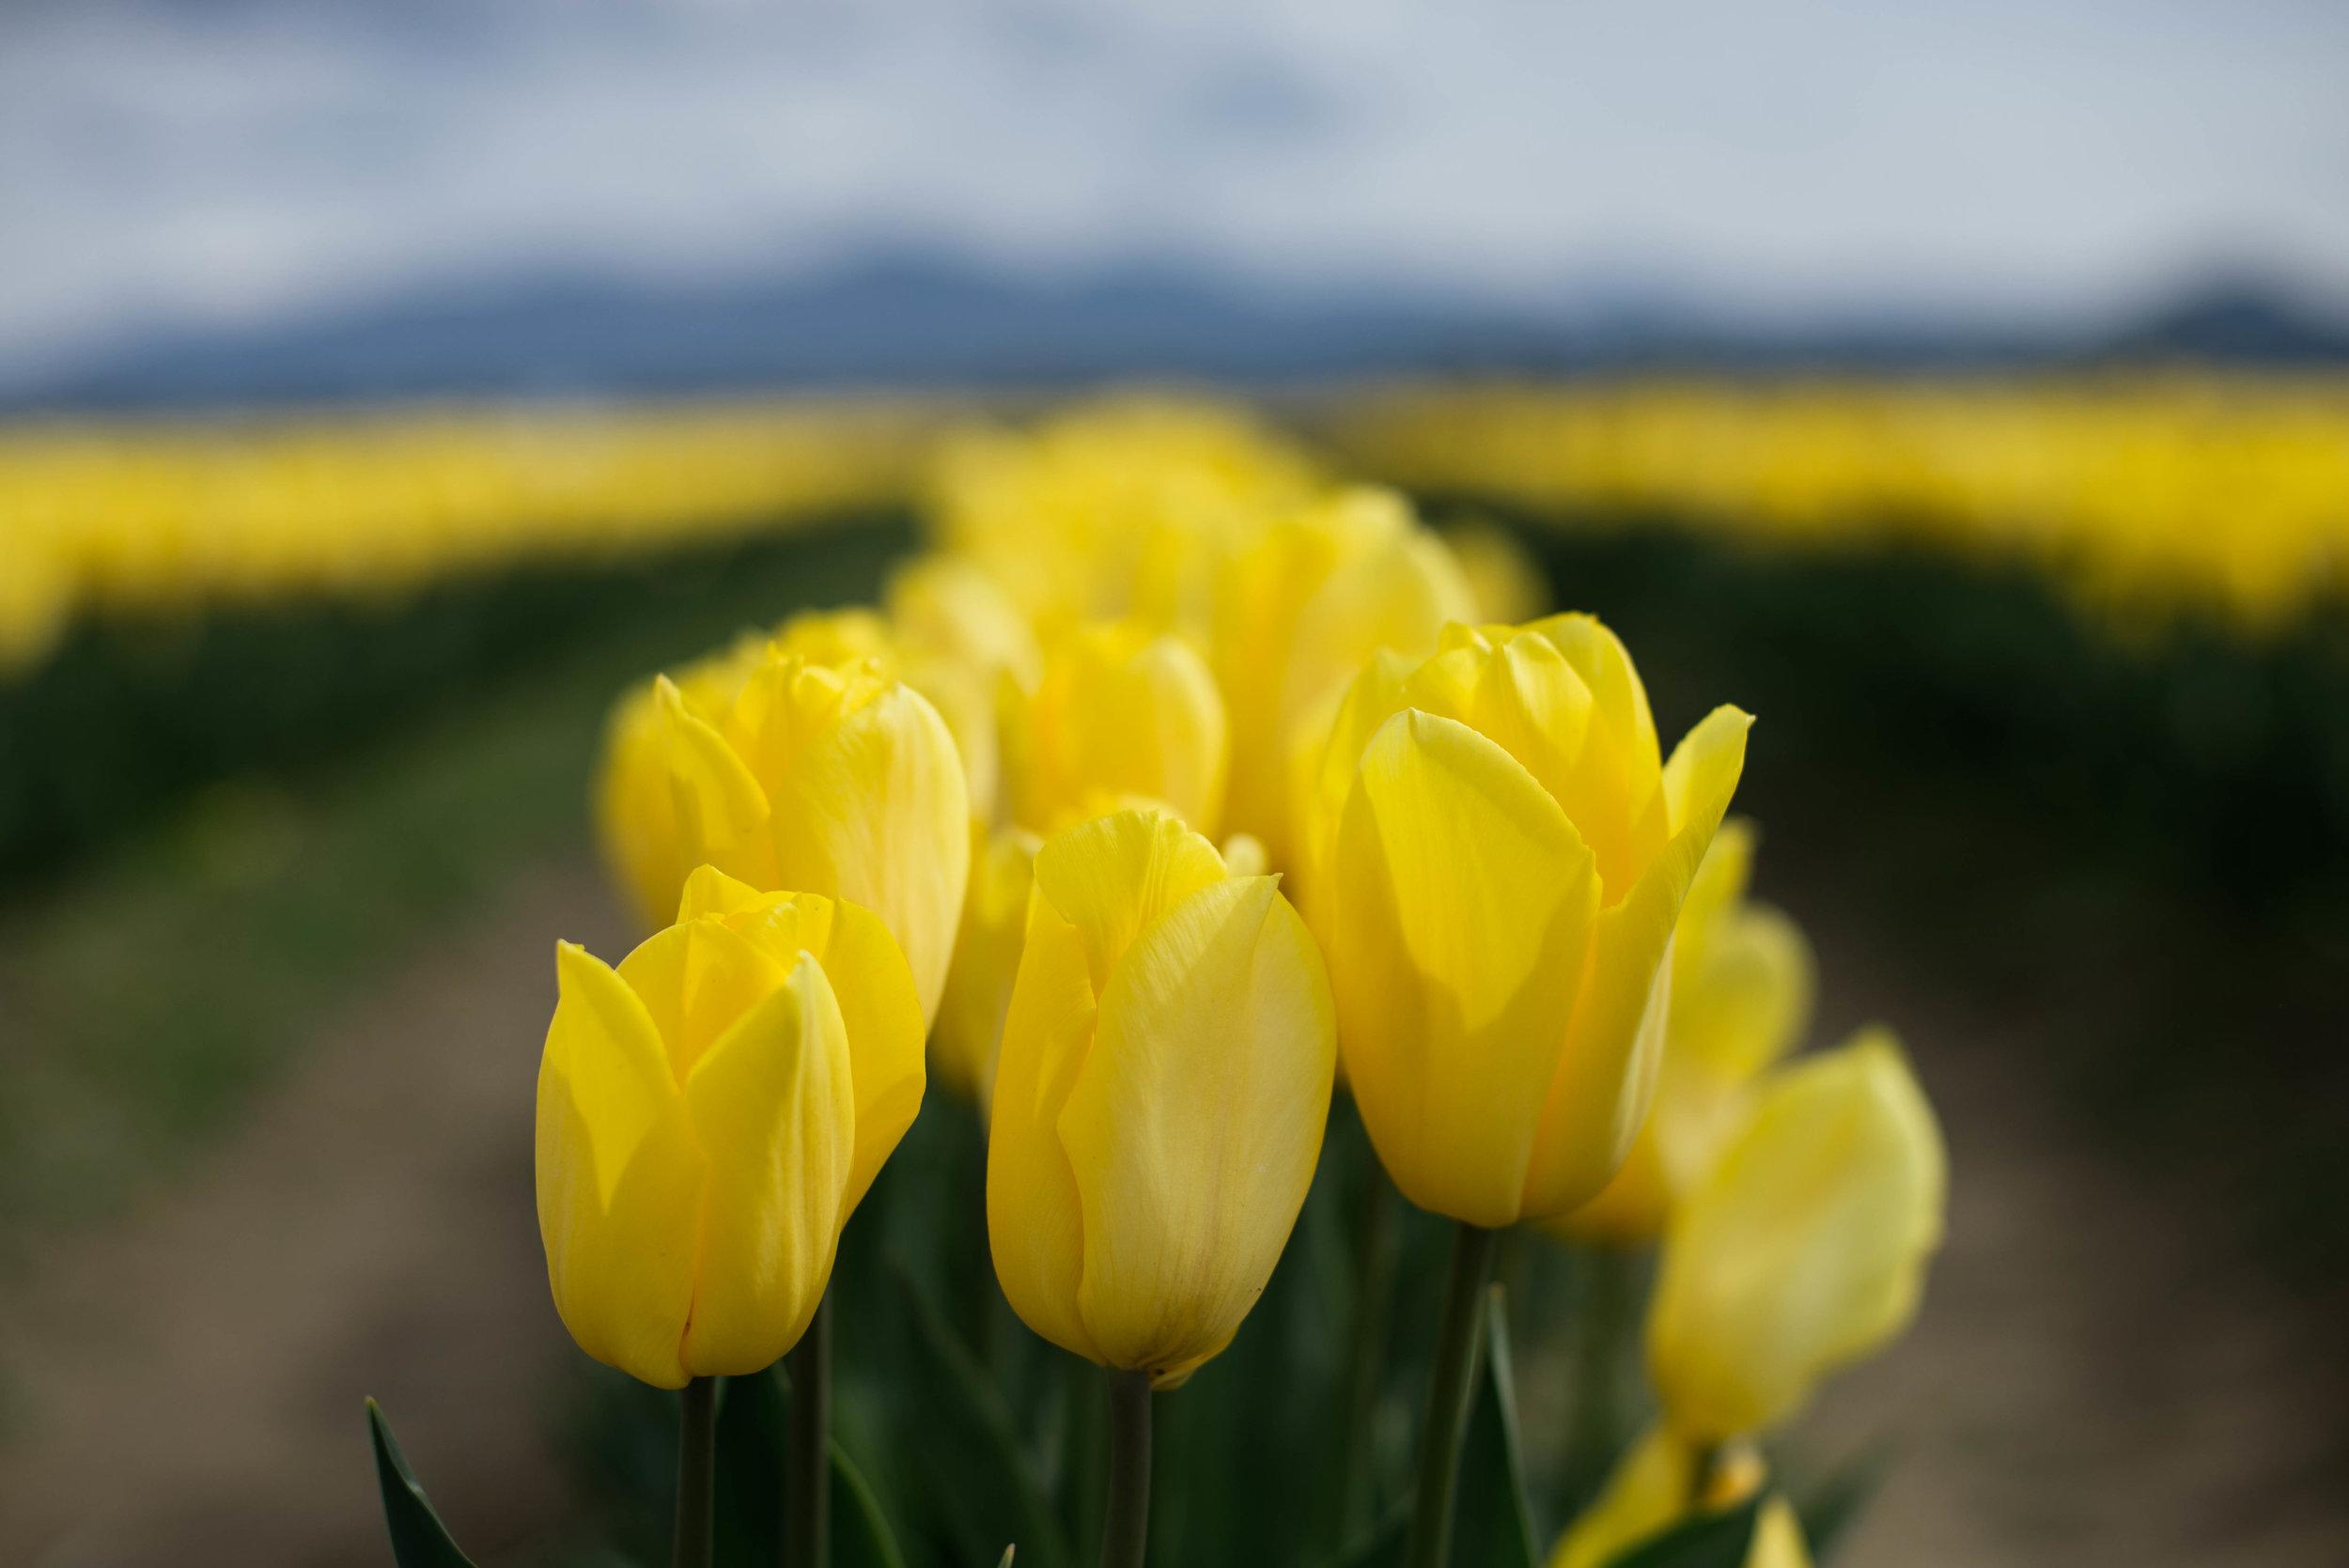 Tulips-7.jpg